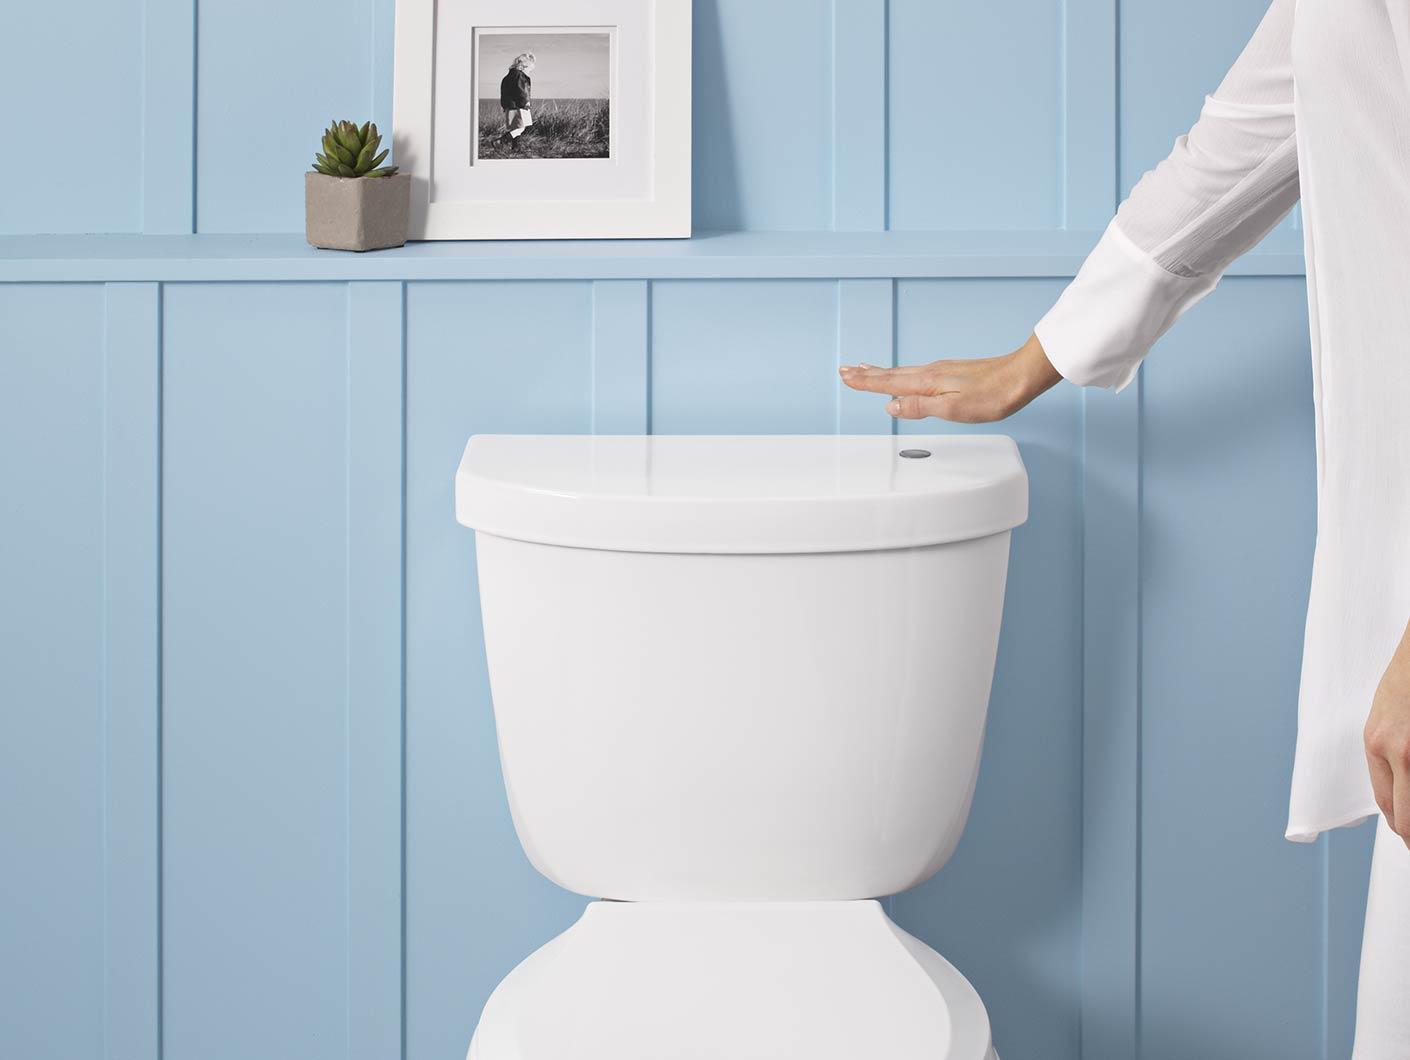 Kohler_Bathroom_Design_Maloney_Interiors_Rhode_Island.jpg